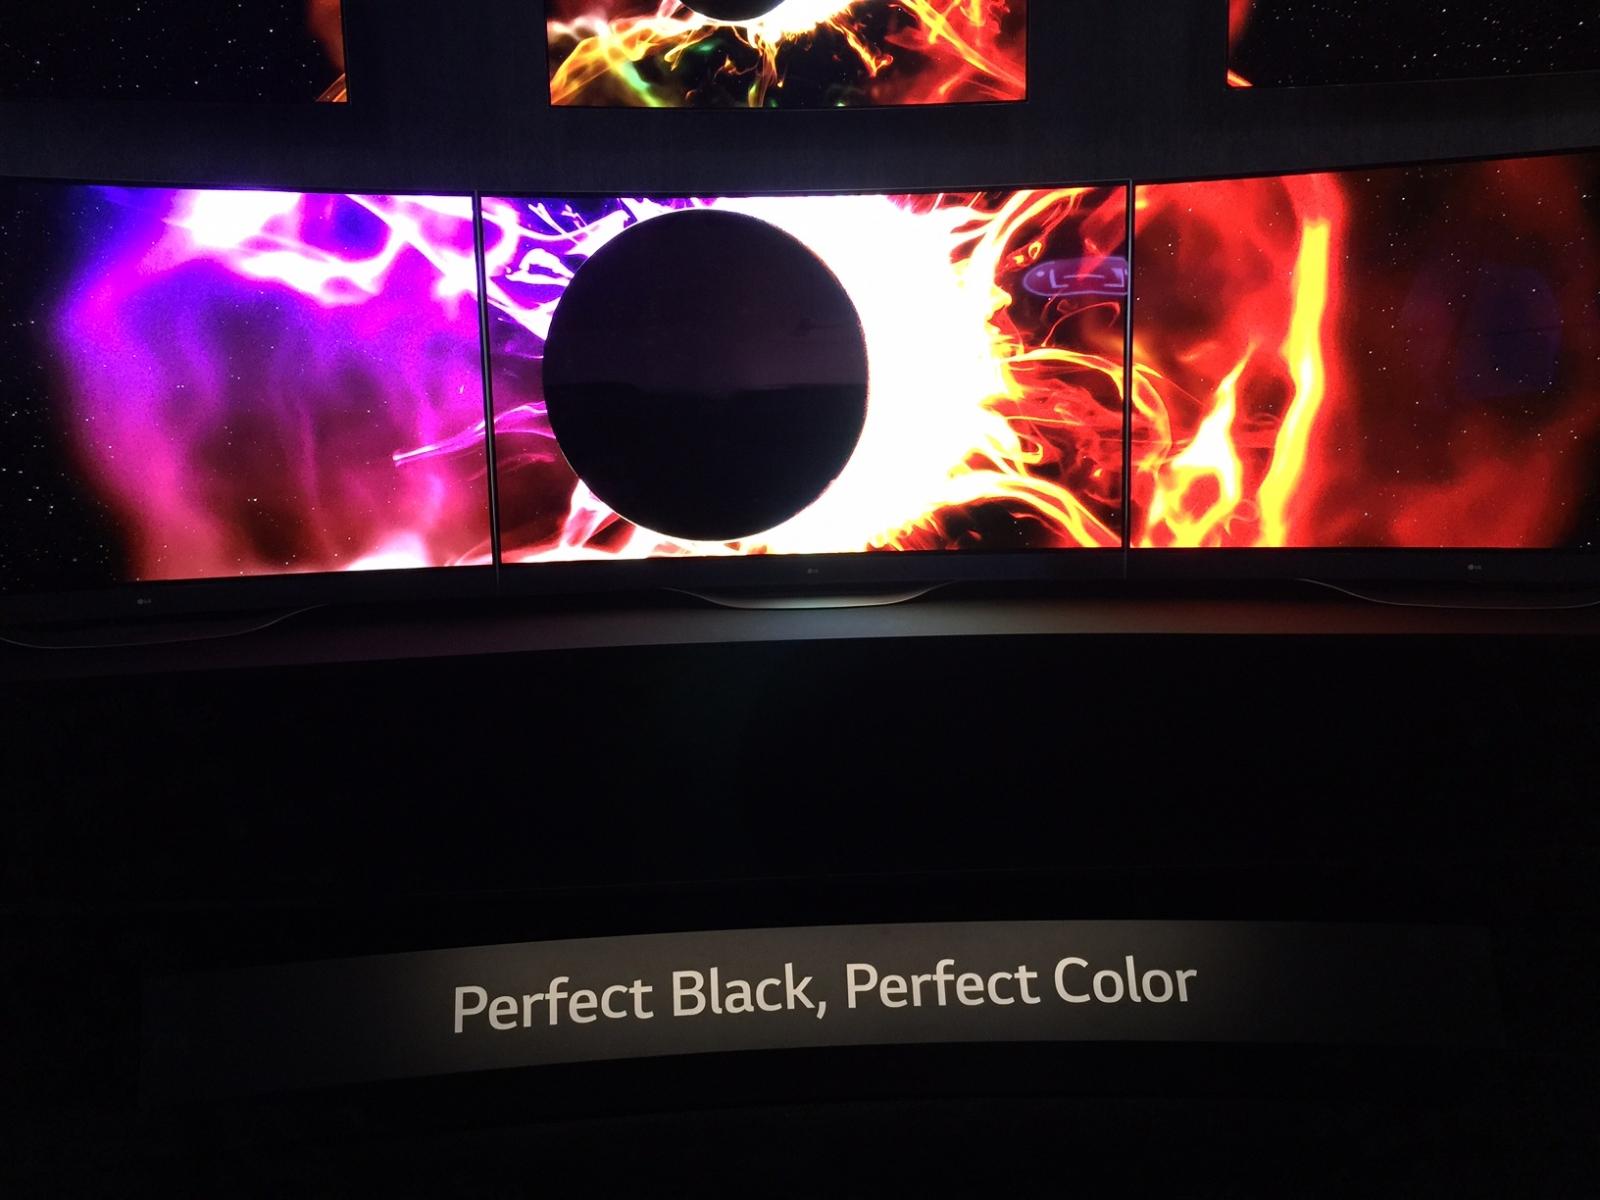 LG Curved 4K OLED TV